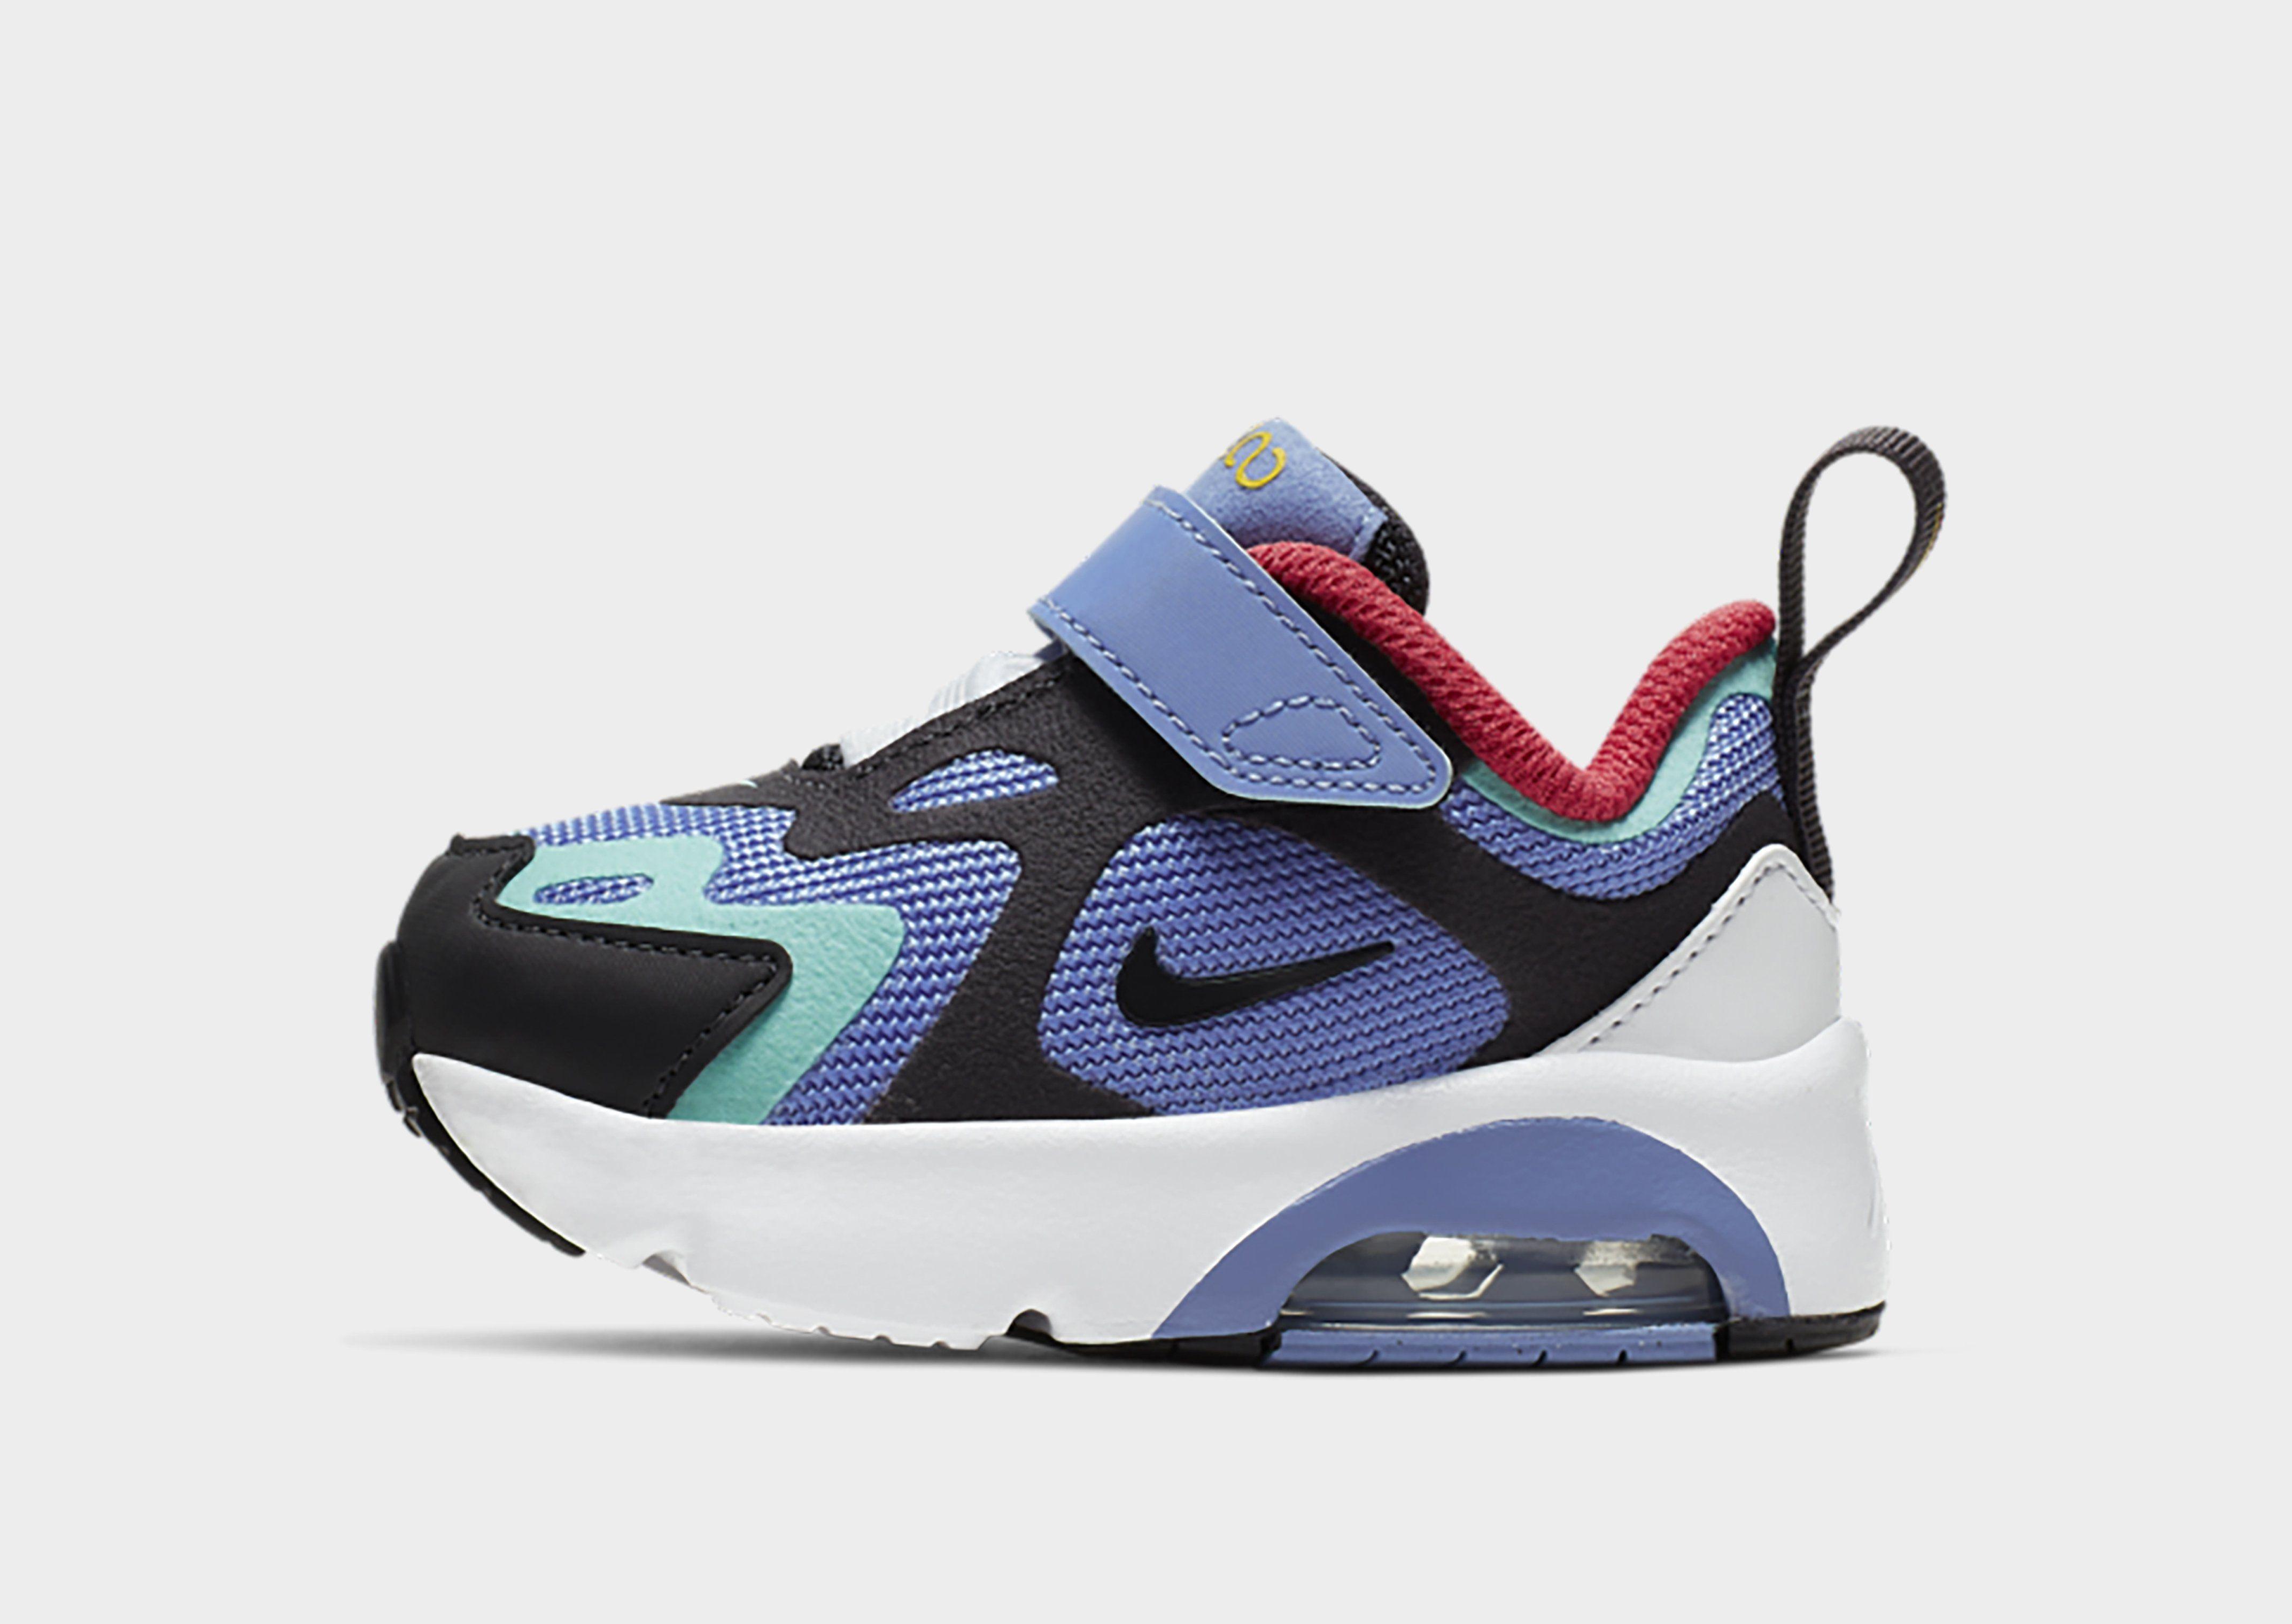 Air Max Homme Nike Midnight MarineLight 720 Bleu Chaussures